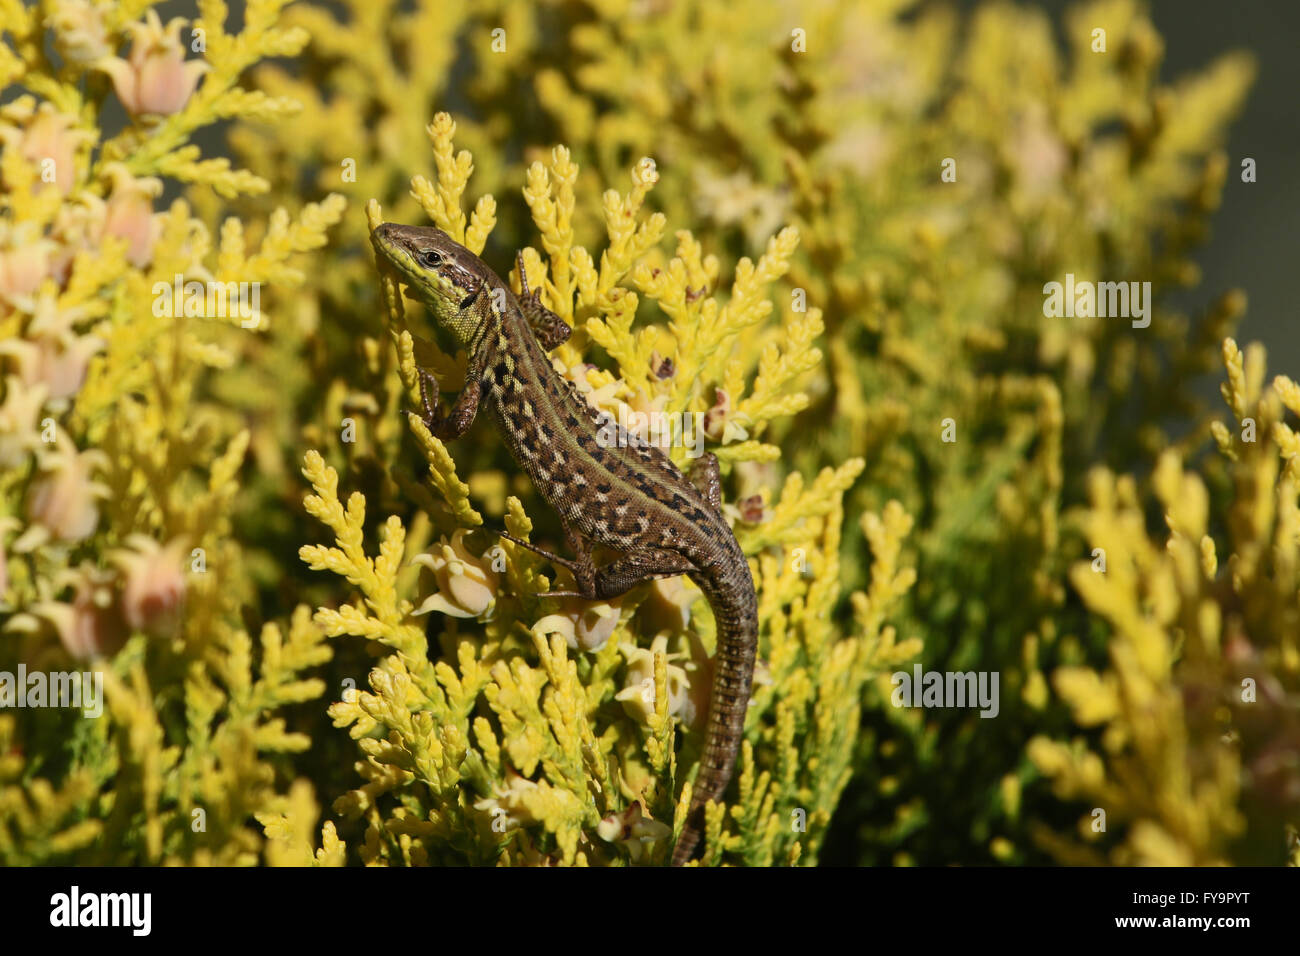 Italian wall lizard climbing a thuya bush podarcis sicula lucertola - Stock Image